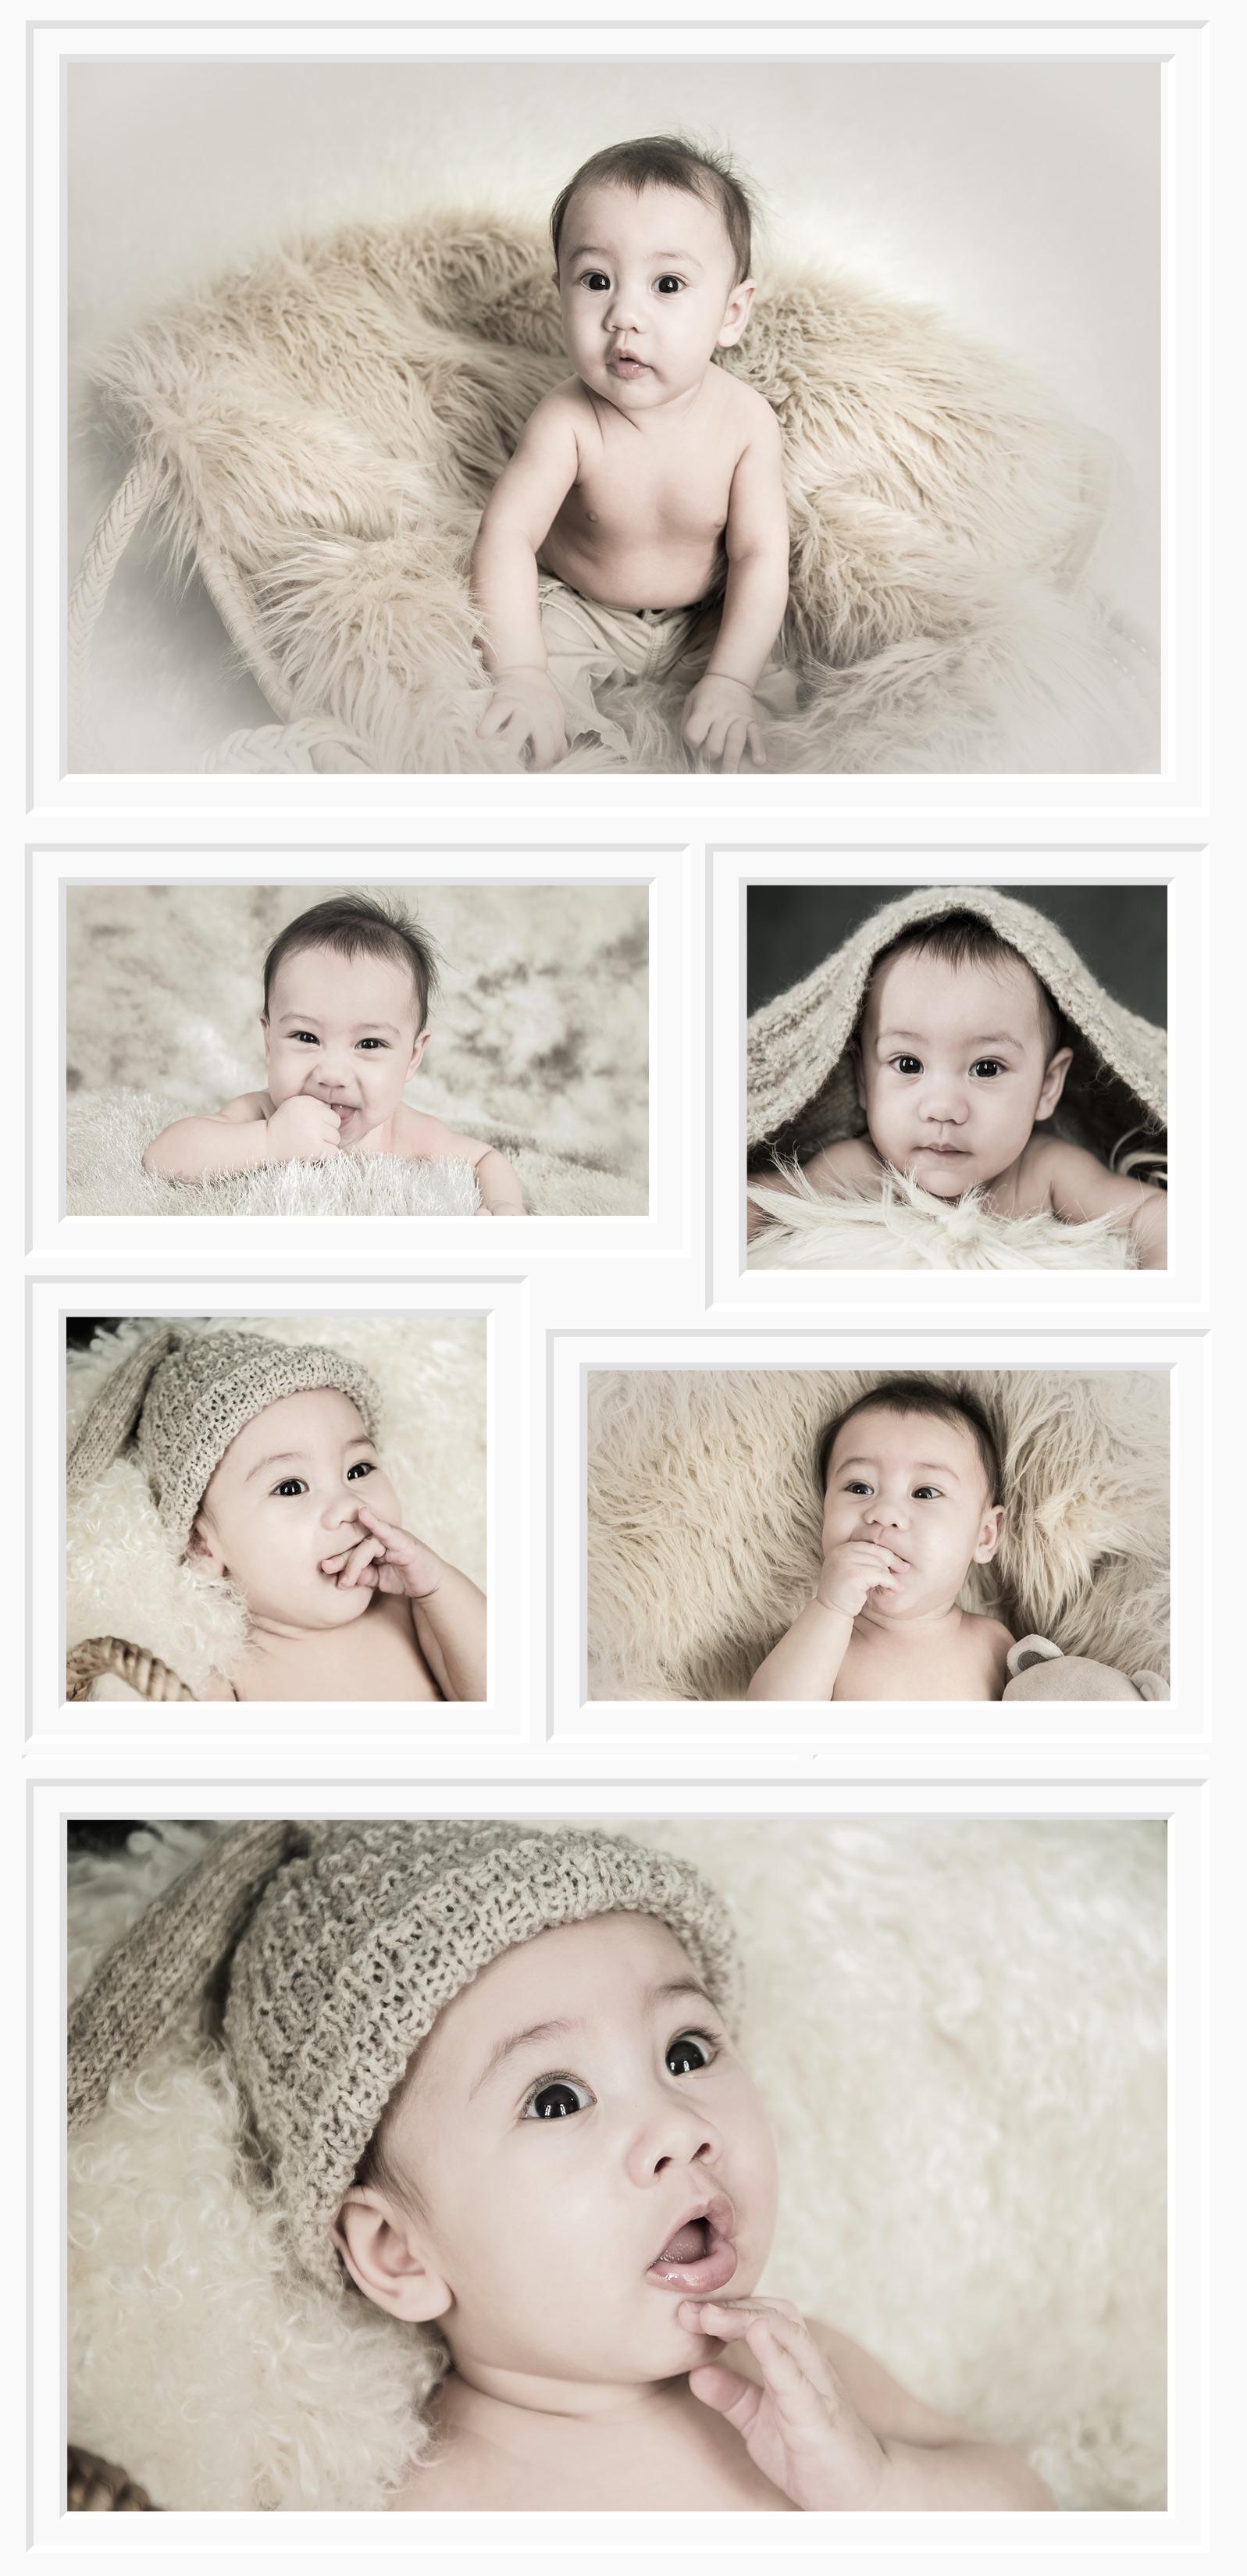 regina-beautiful-baby-photos-free-lense-photo.jpg